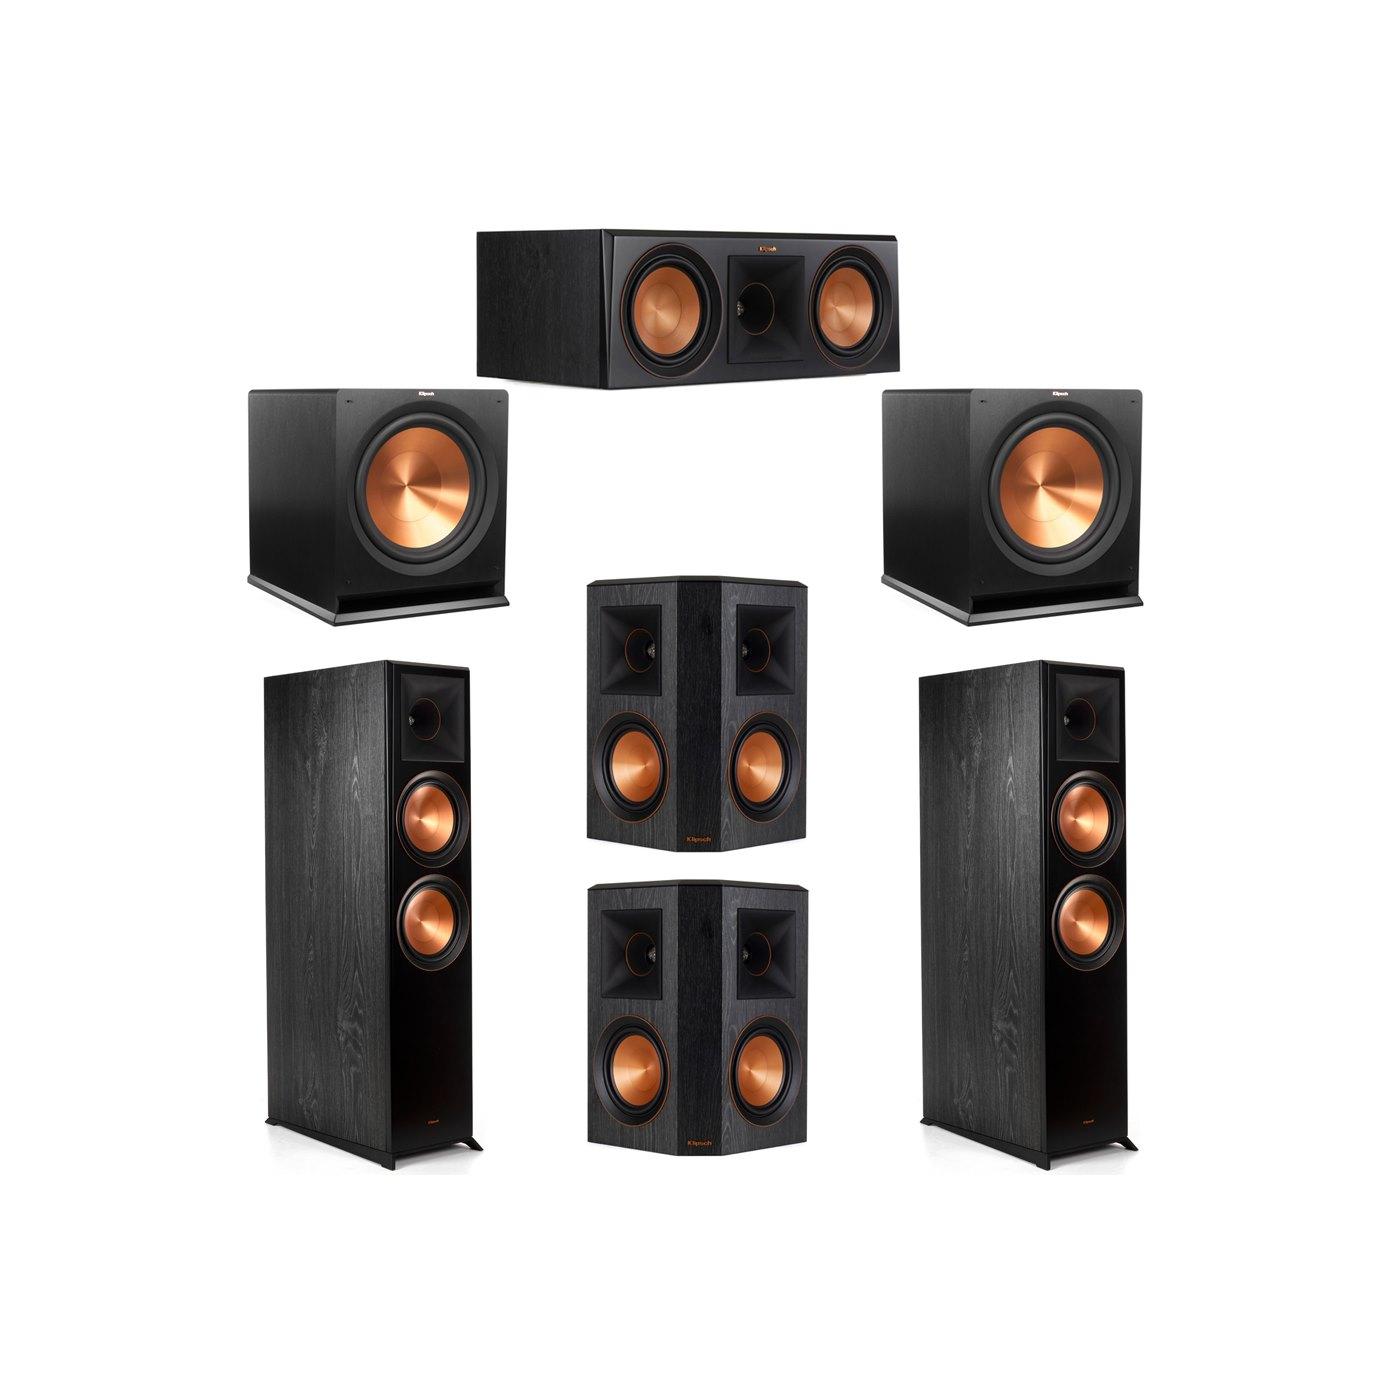 Klipsch 5.2 System with 2 RP-8000F Floorstanding Speakers, 1 Klipsch RP-600C Center Speaker, 2 Klipsch RP-502S Surround Speakers, 2 Klipsch R-115SW Subwoofers